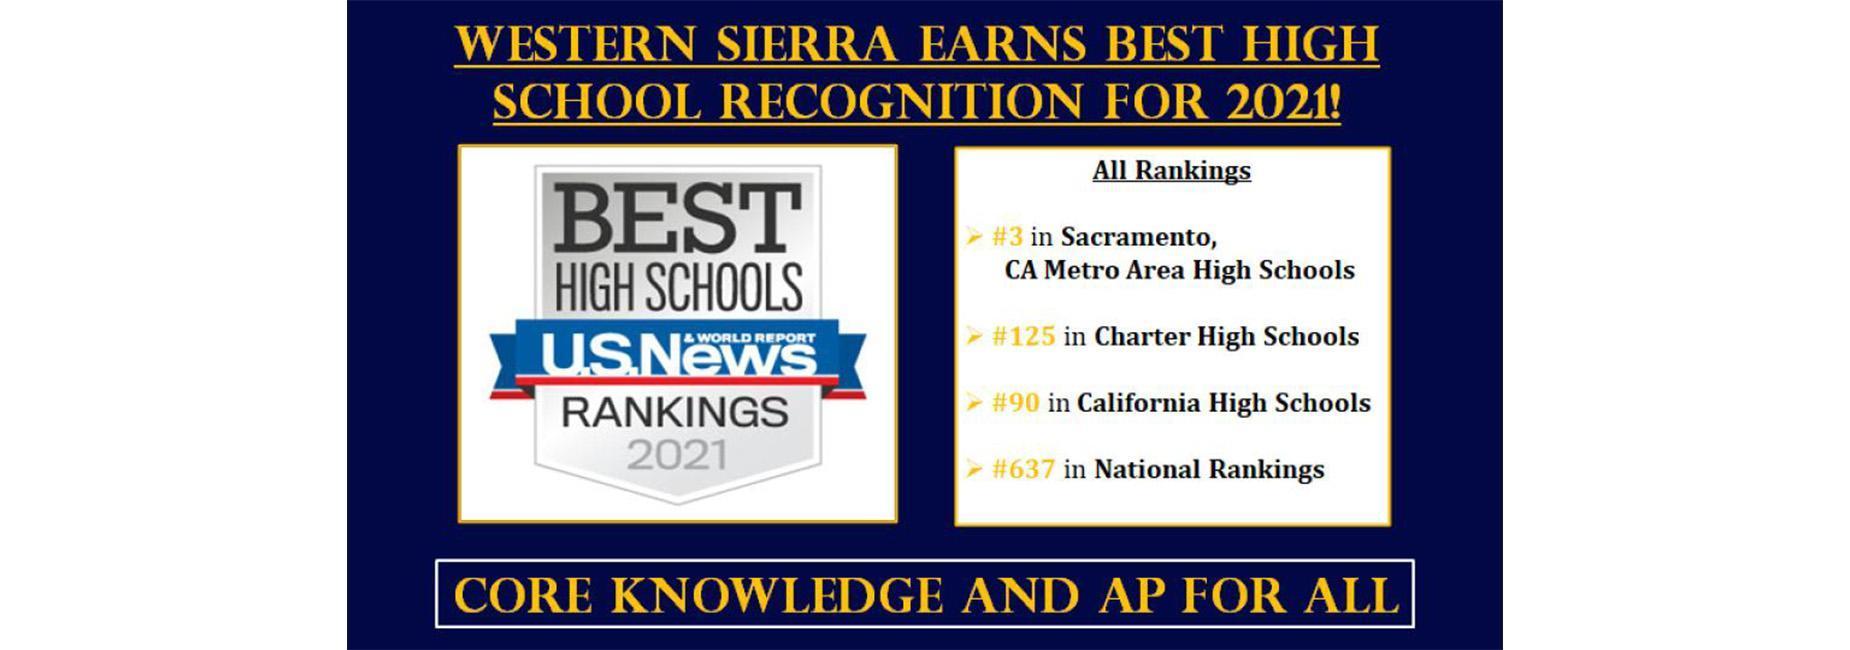 Best High School 2021 Recognition